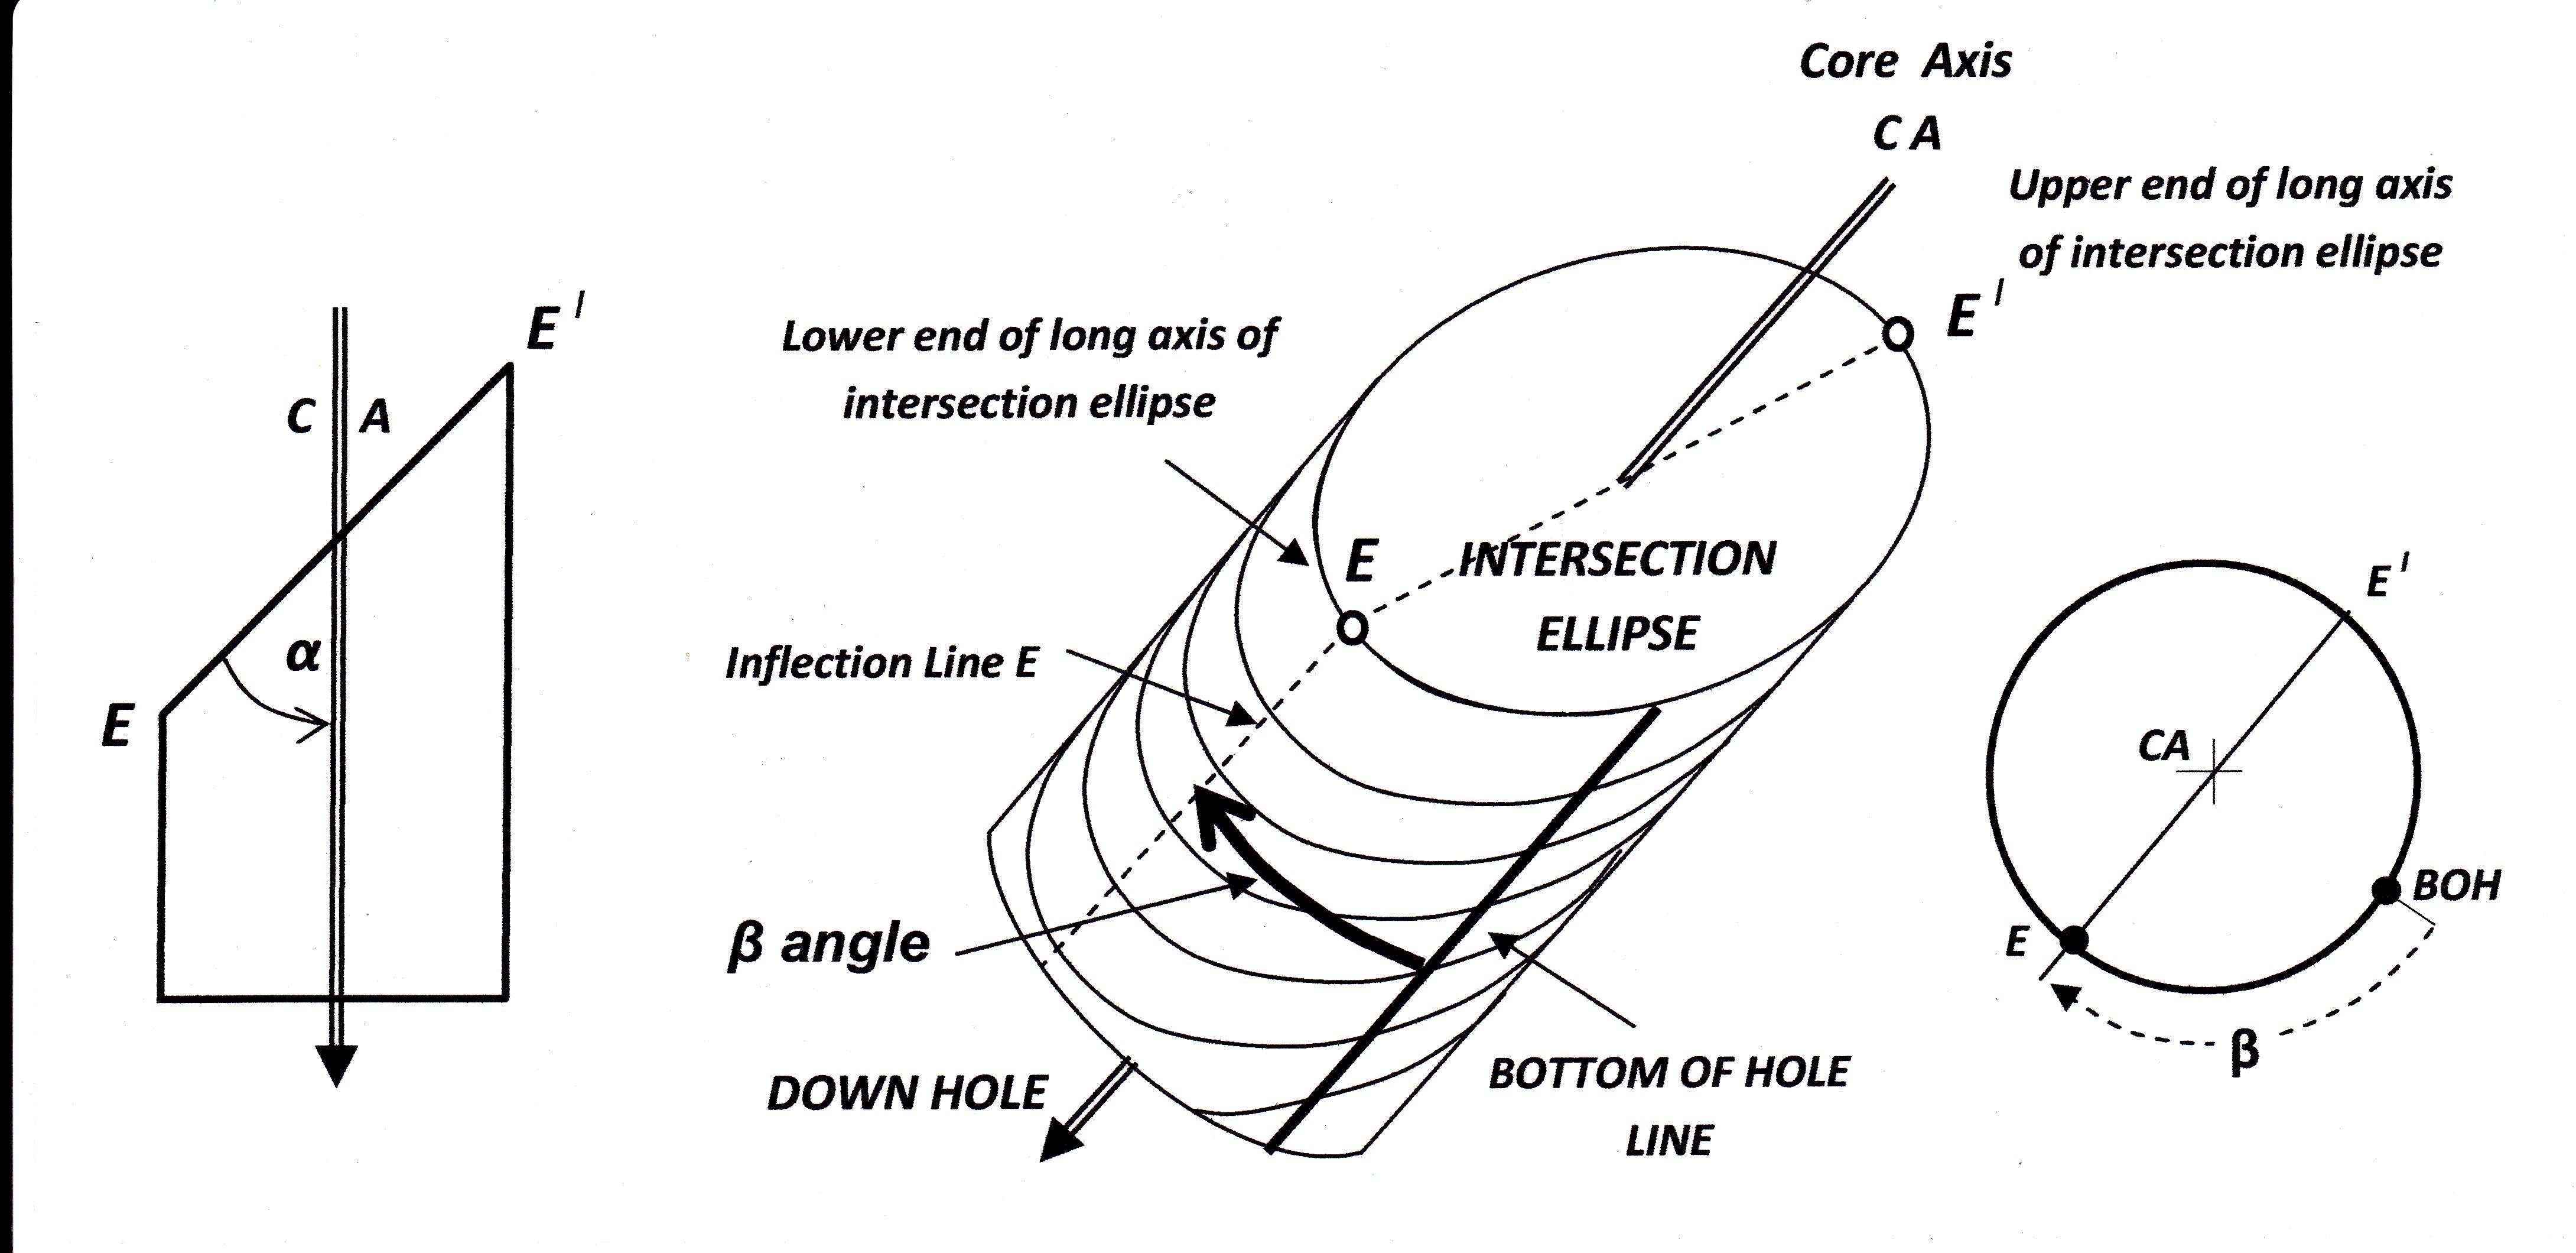 beta and alpha sheet angles orientation mark Buscar con